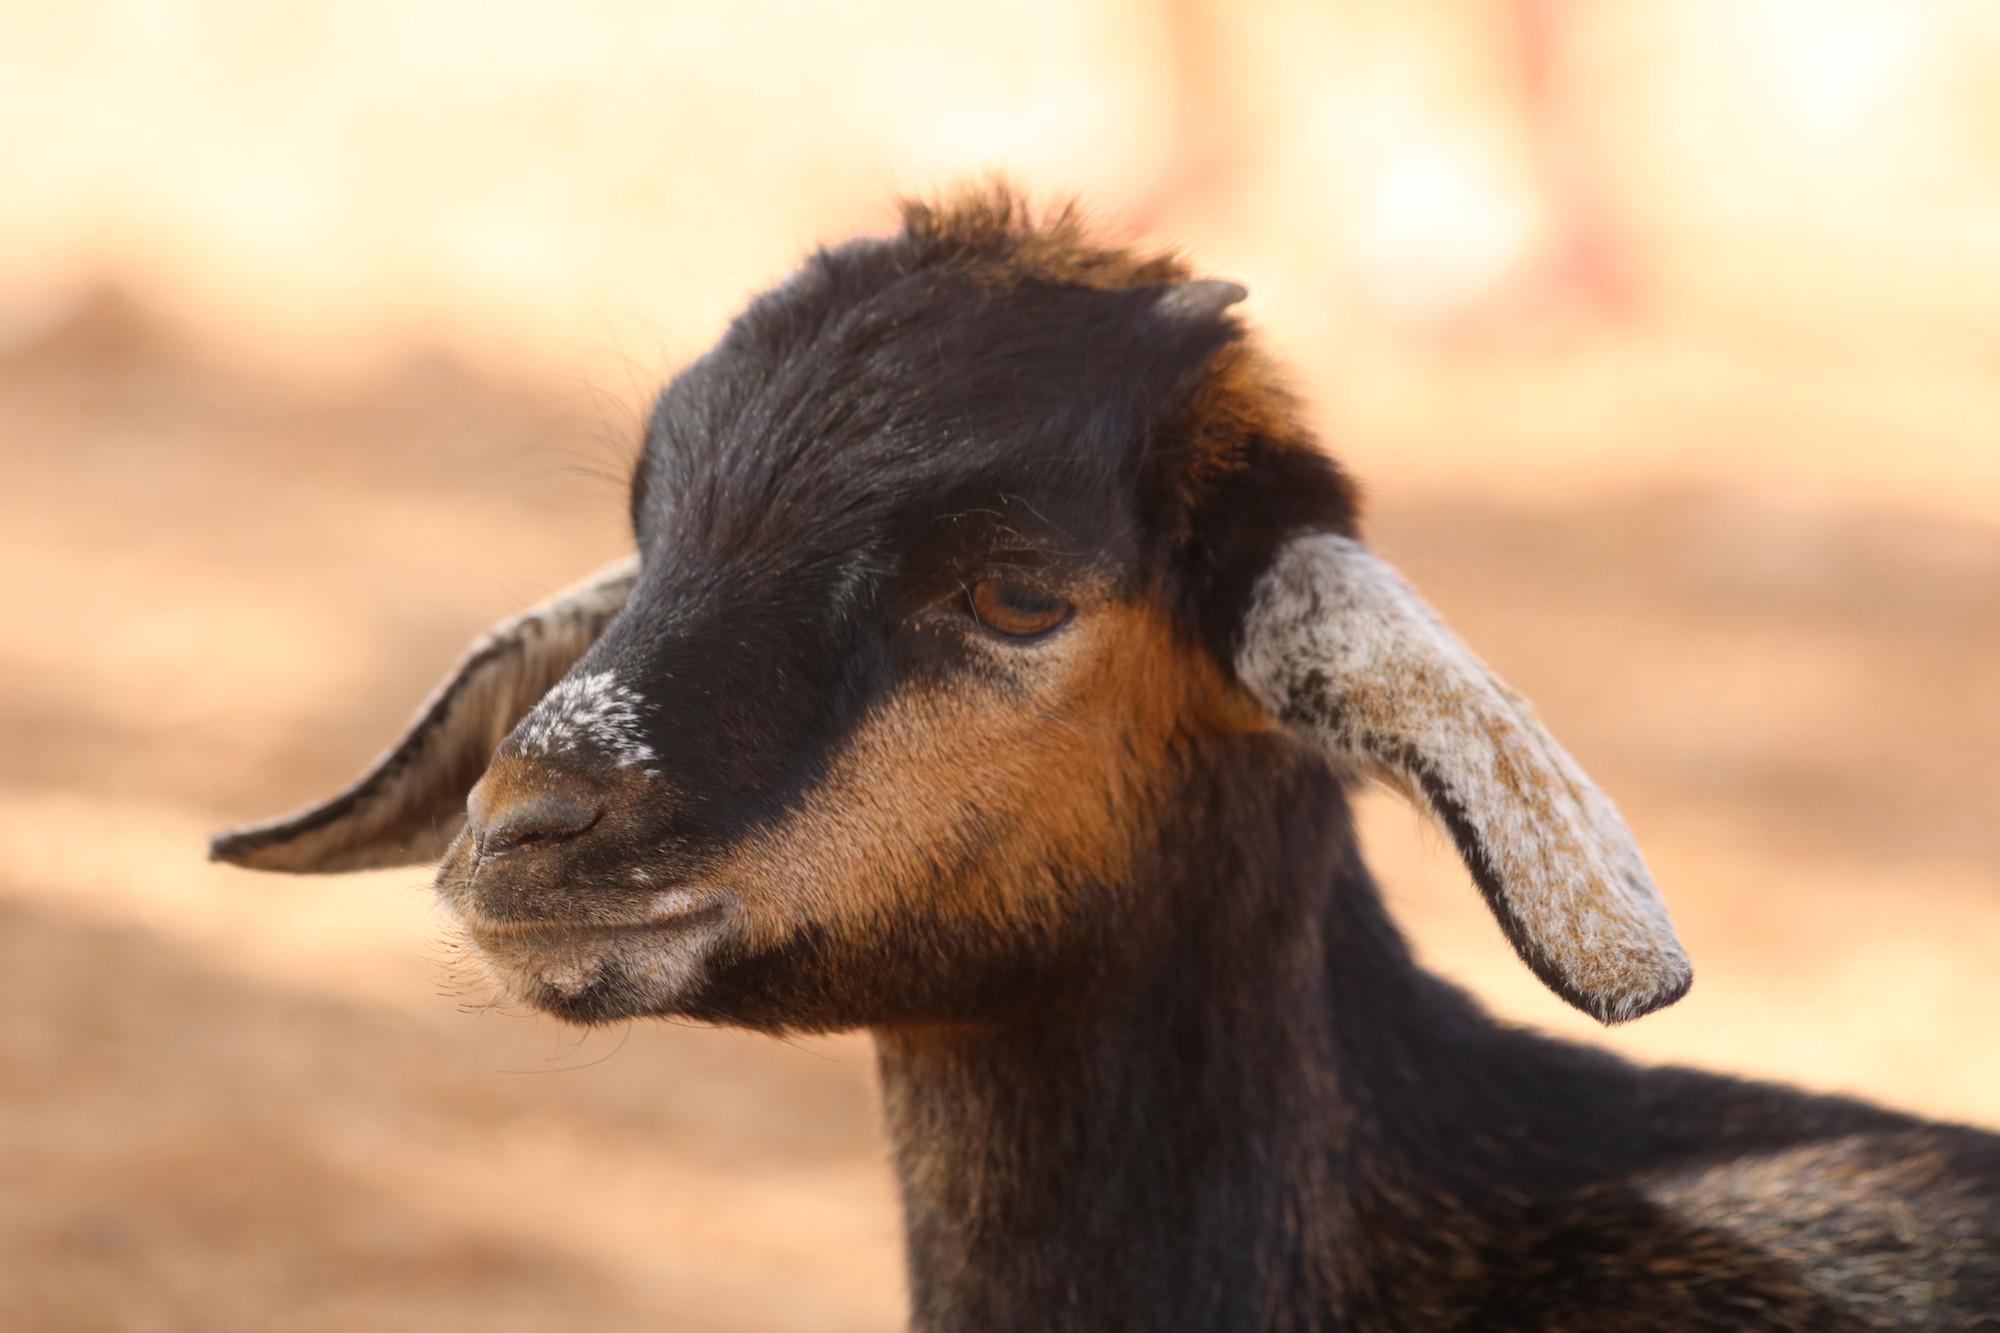 morroco-baby-goat.JPG